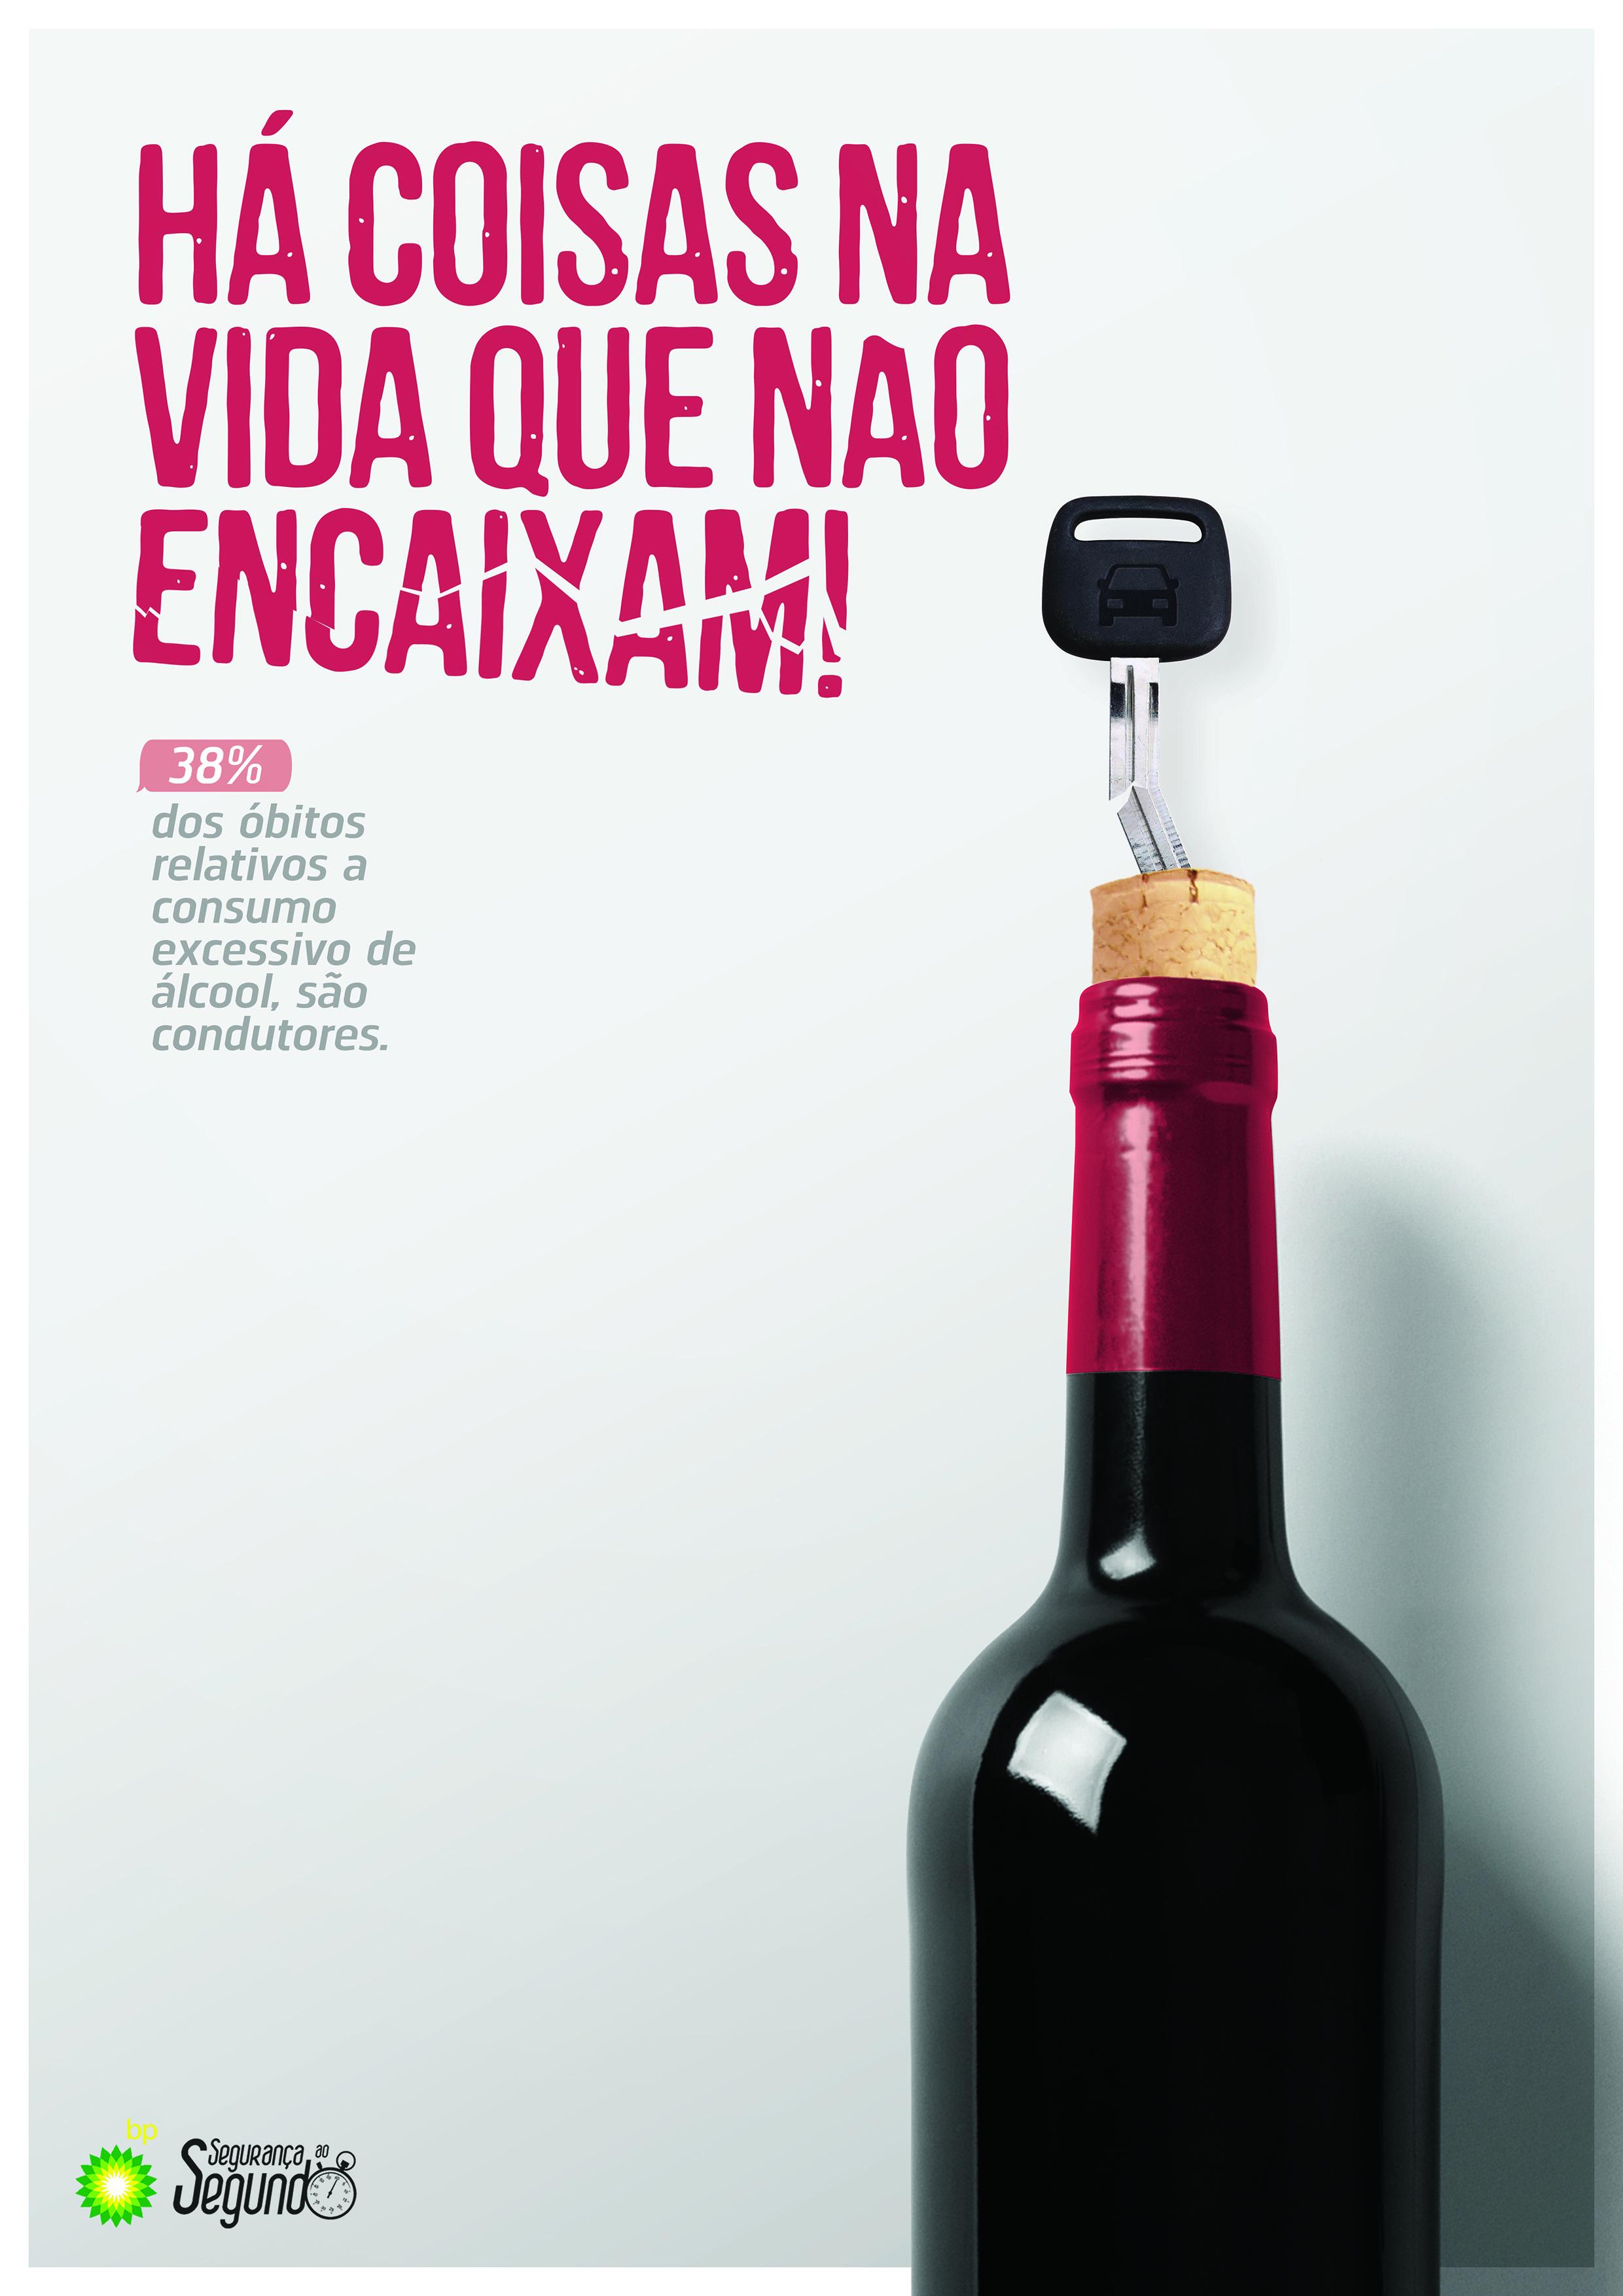 GuiHackers cartaz_8